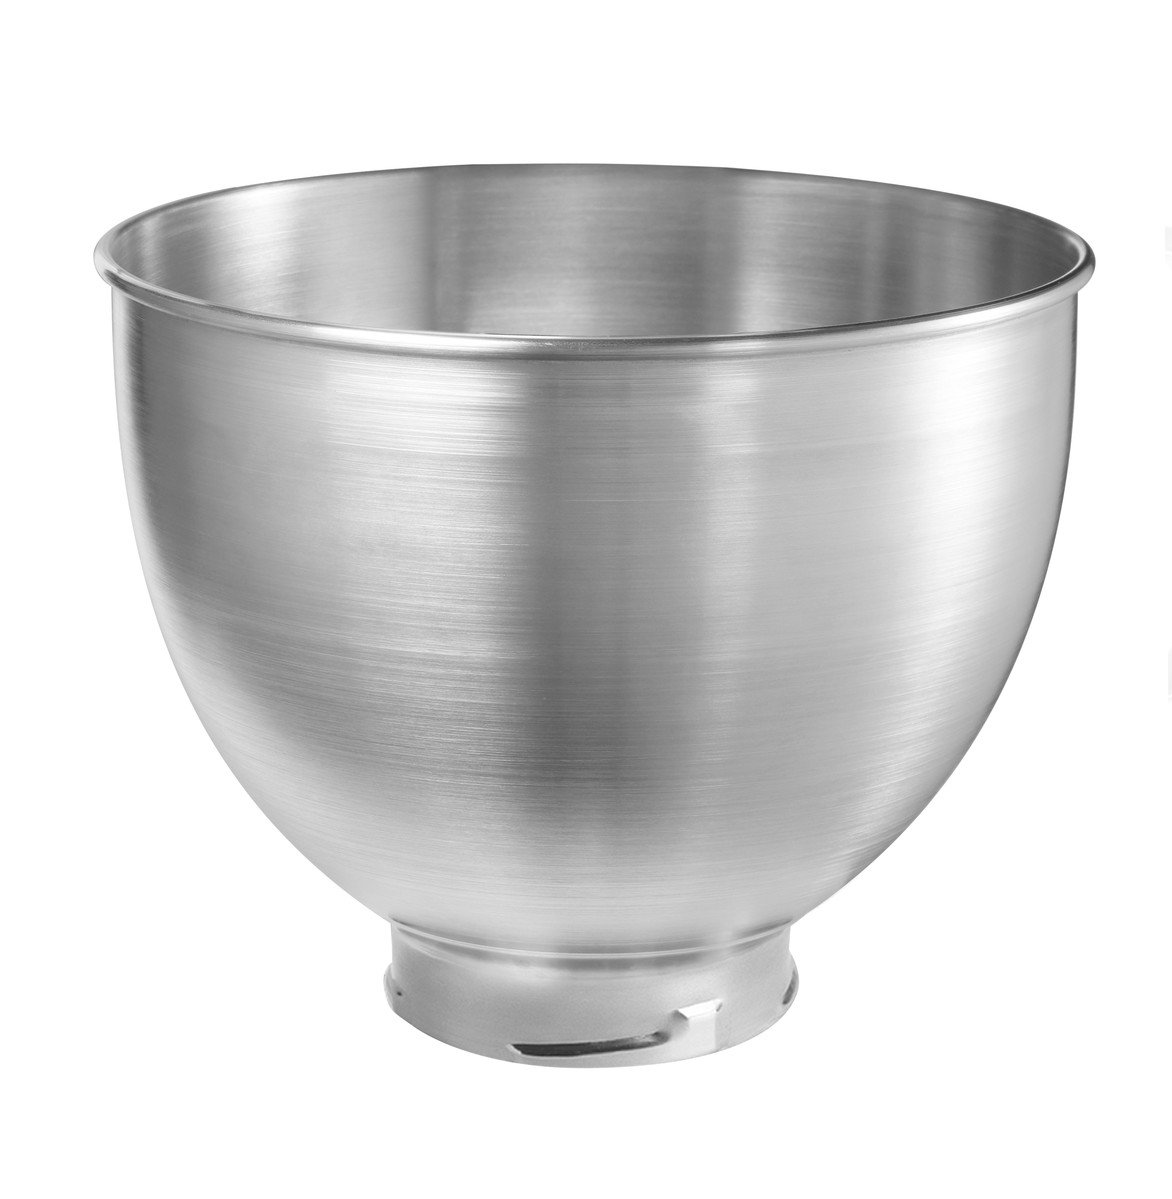 KitchenAid-5K45SSESL-Kchenmaschine-silver